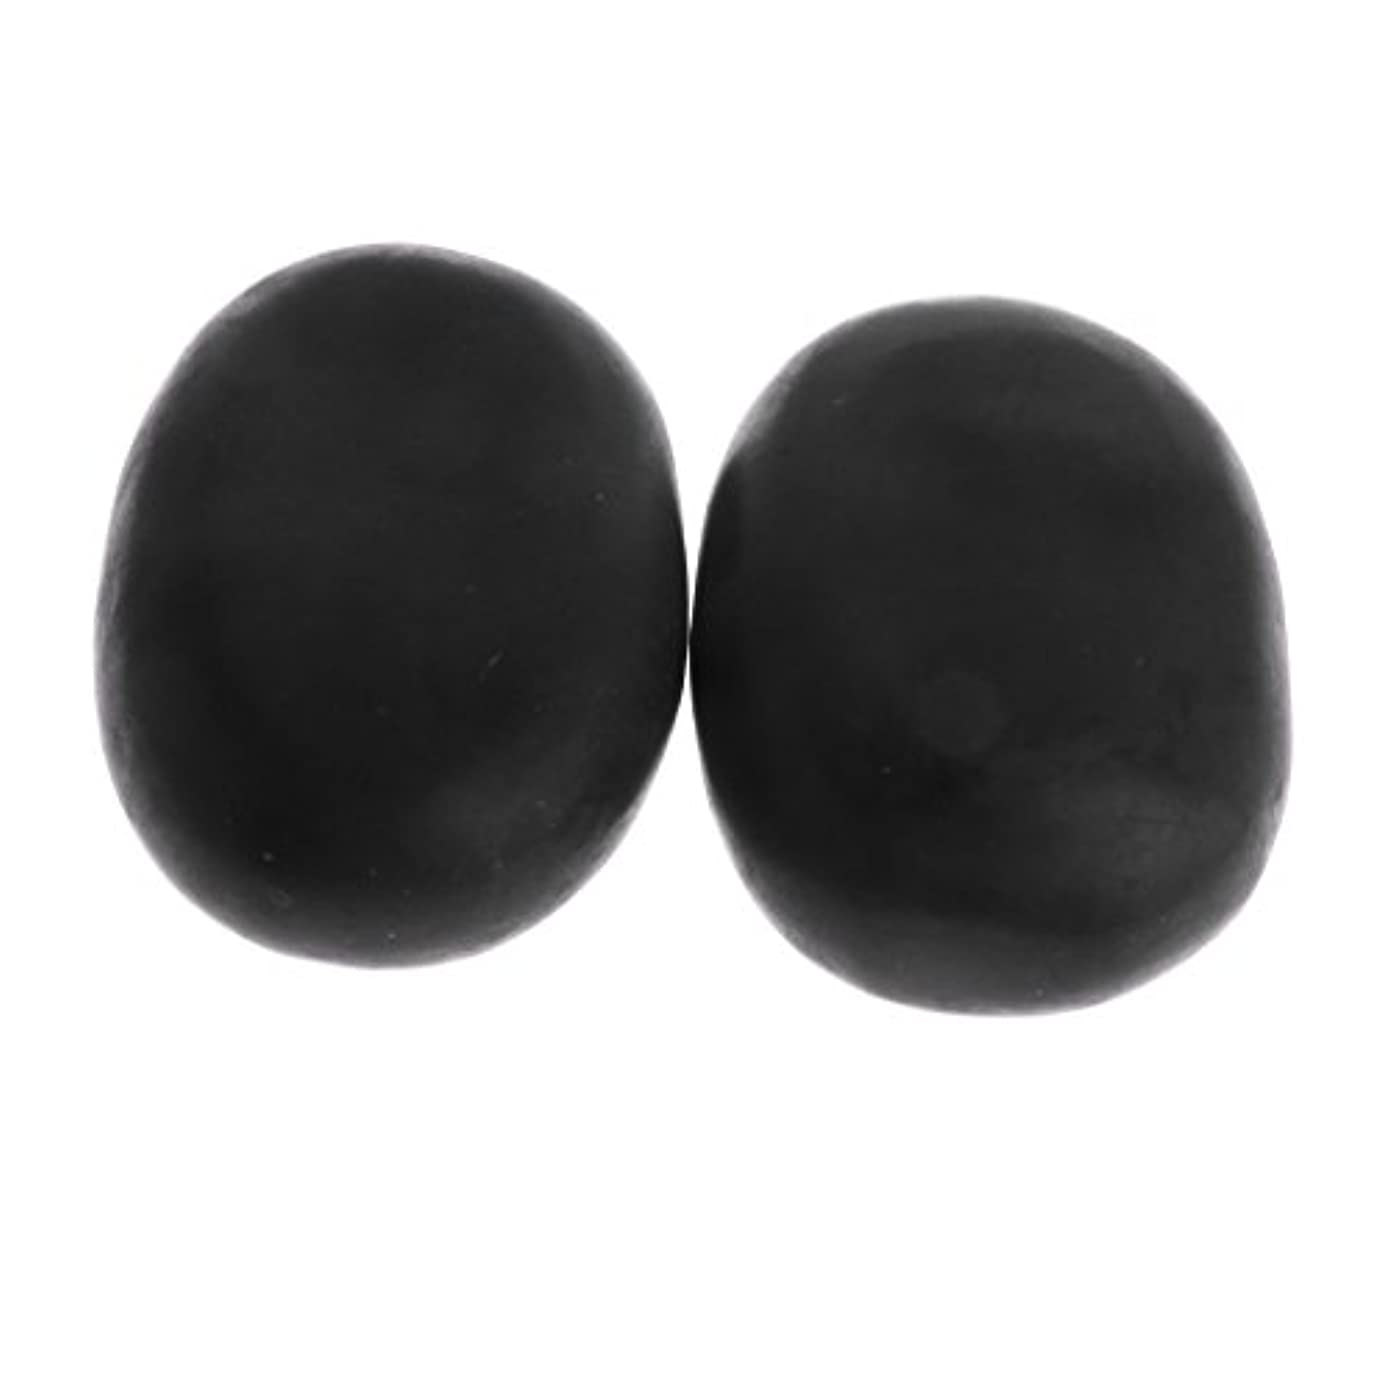 Baosity マッサージ石 2個 温泉石 玄武岩 火山石 マッサージ 溶岩 エステ 自然石 美容 SPA